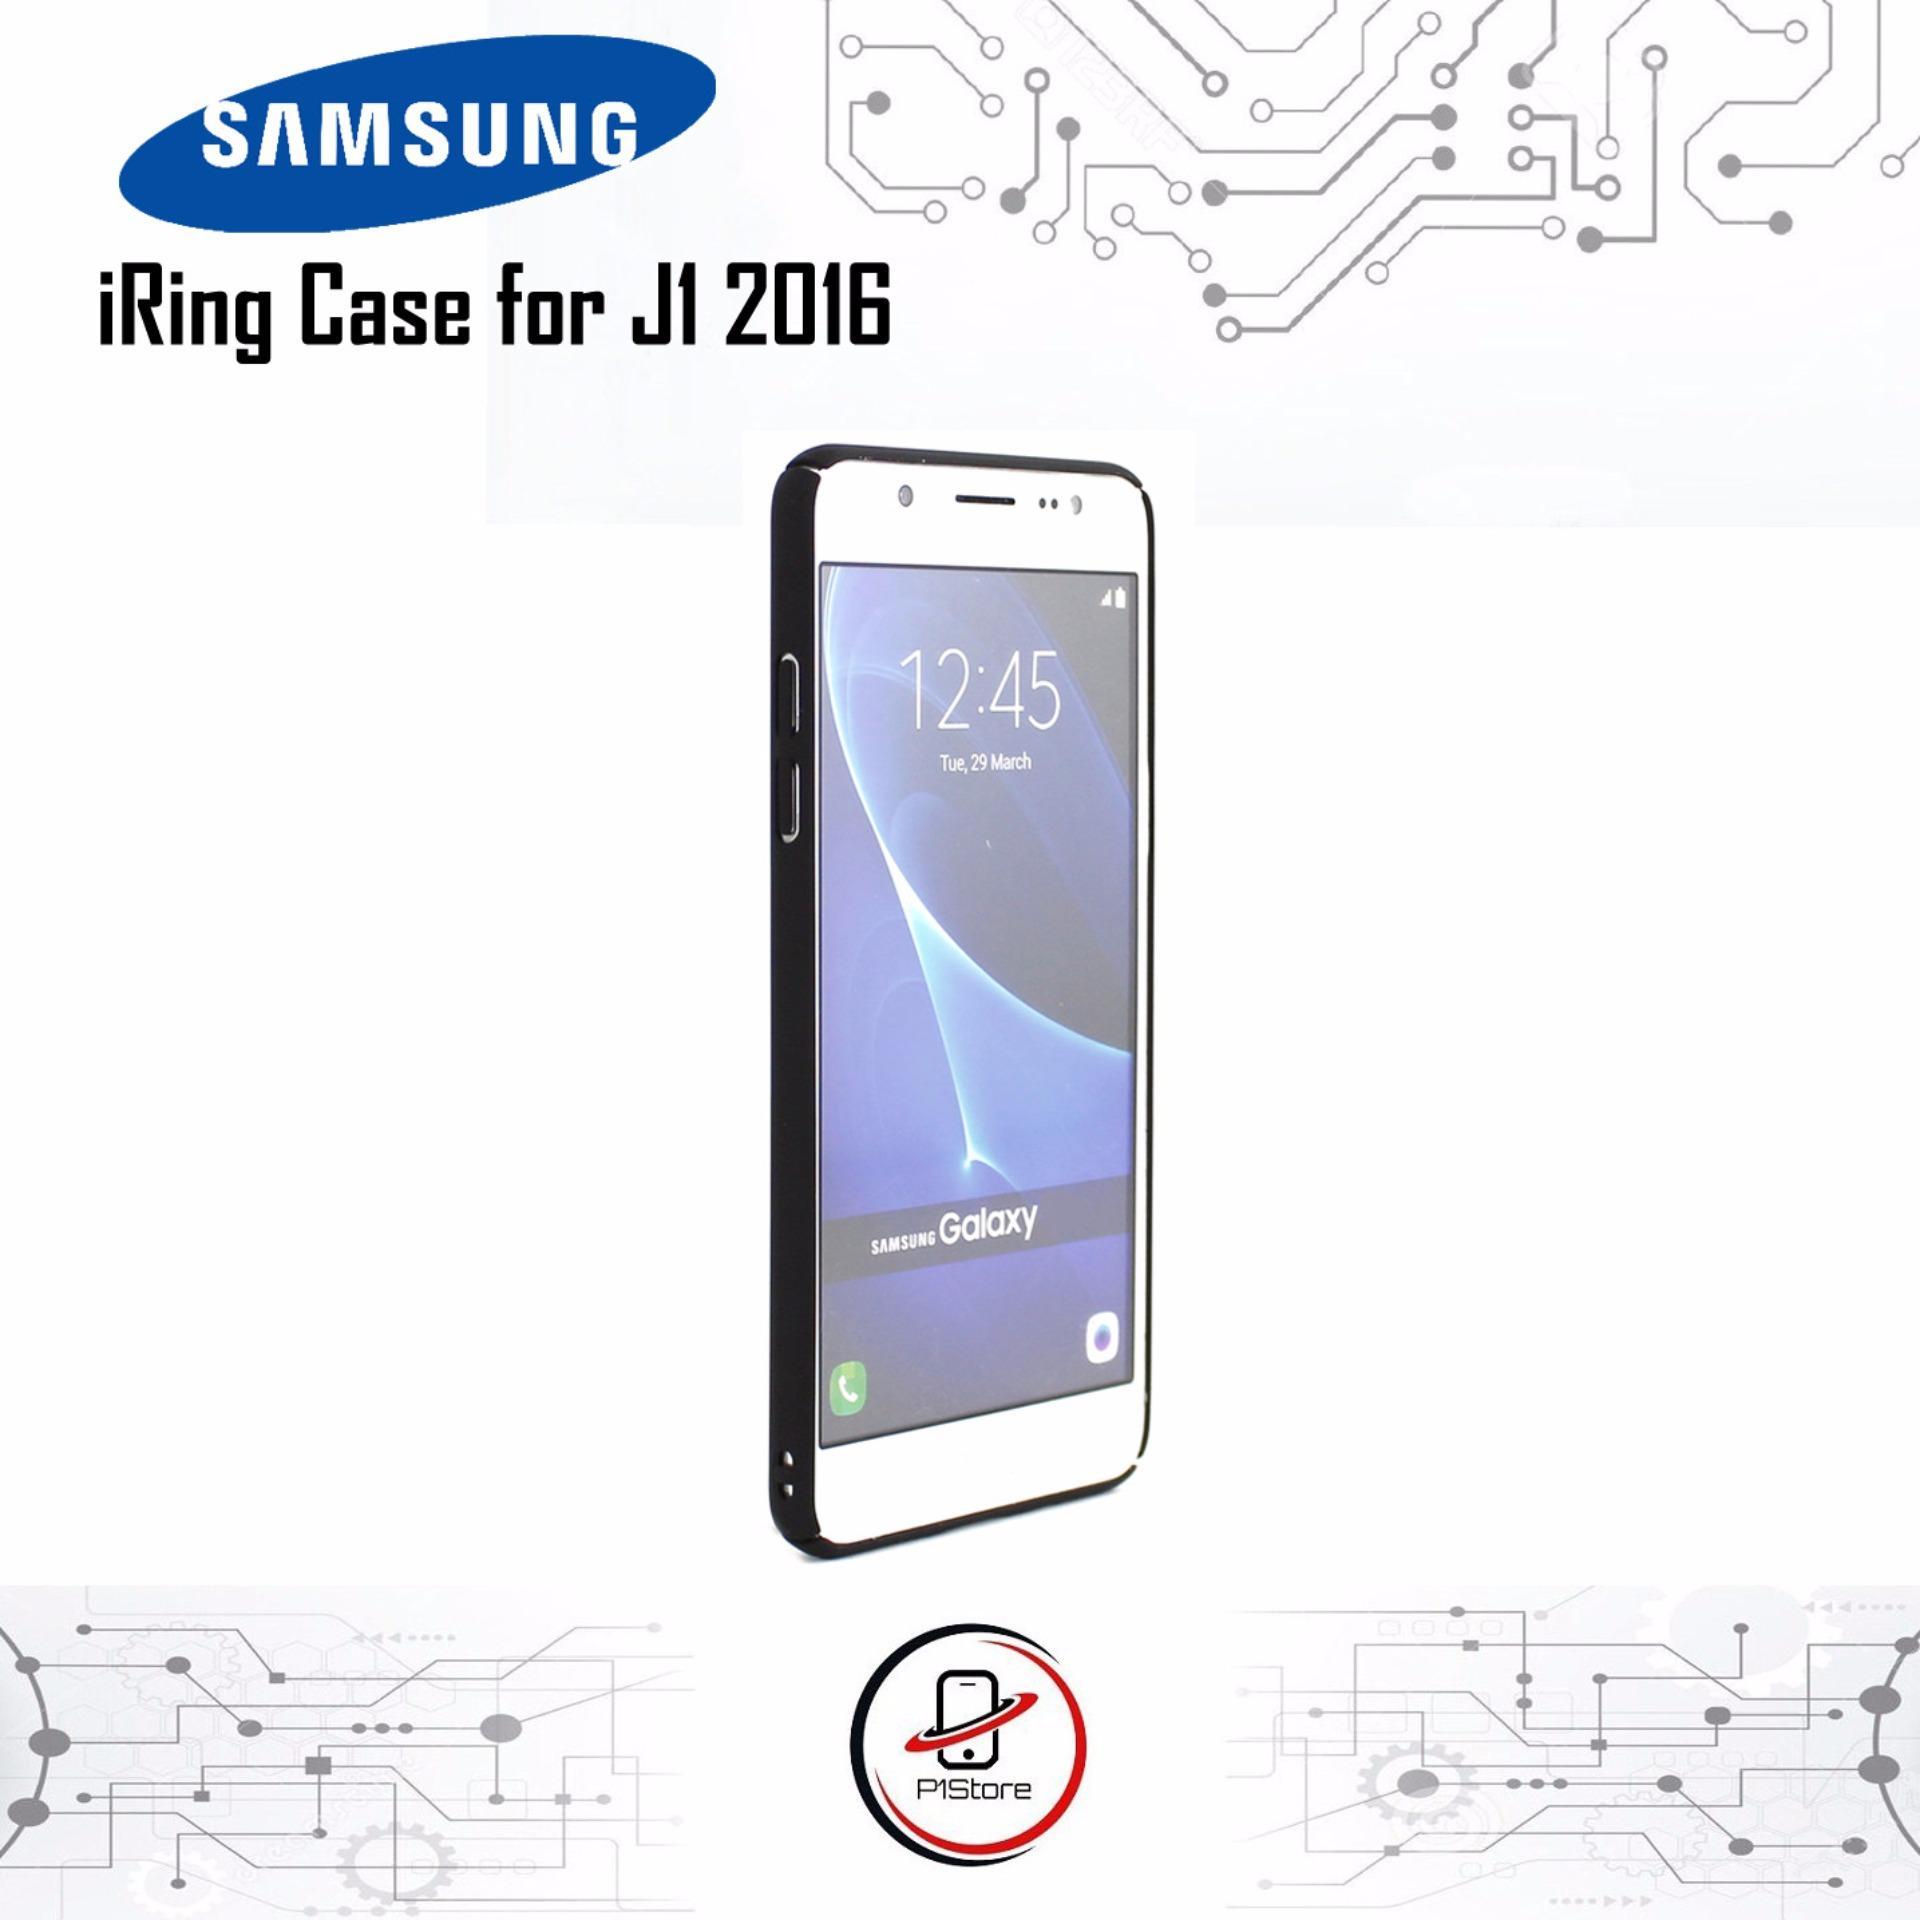 P1 IRing Case Matte Samsung J1 2016 Hardcase Cover Casing .